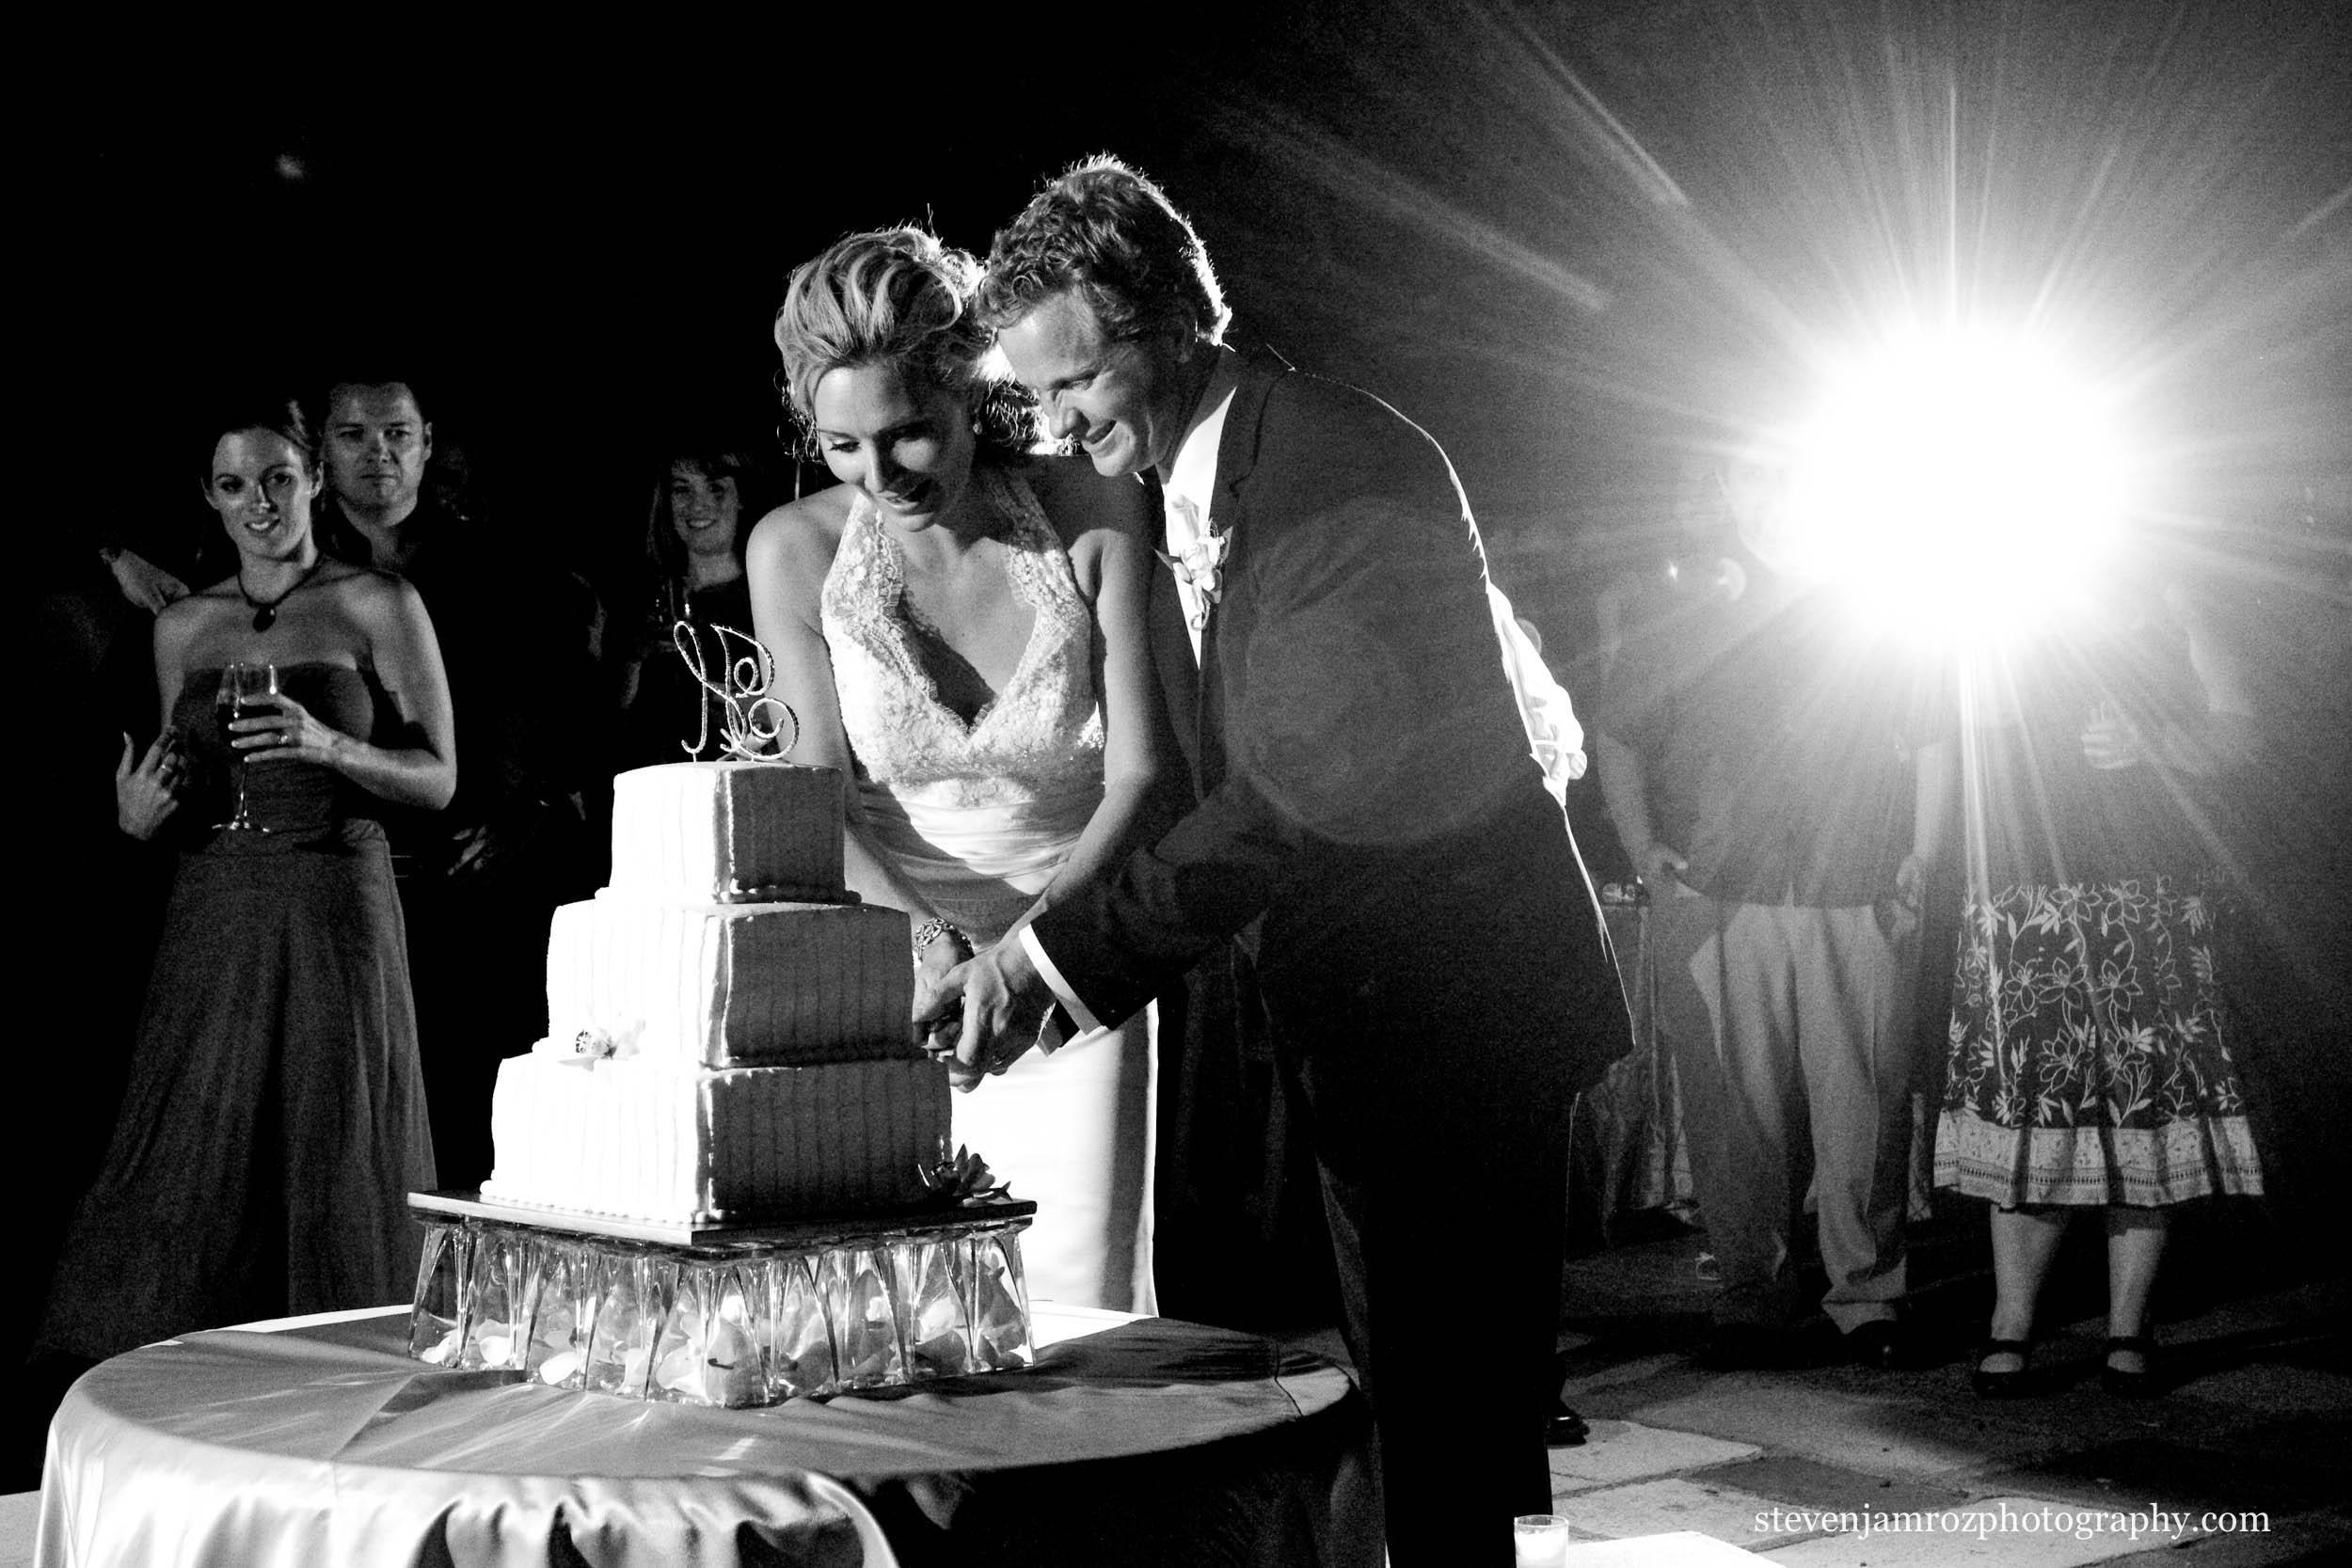 cutting-cake-raleigh-wedding-steven-jamroz-photography-0475.jpg